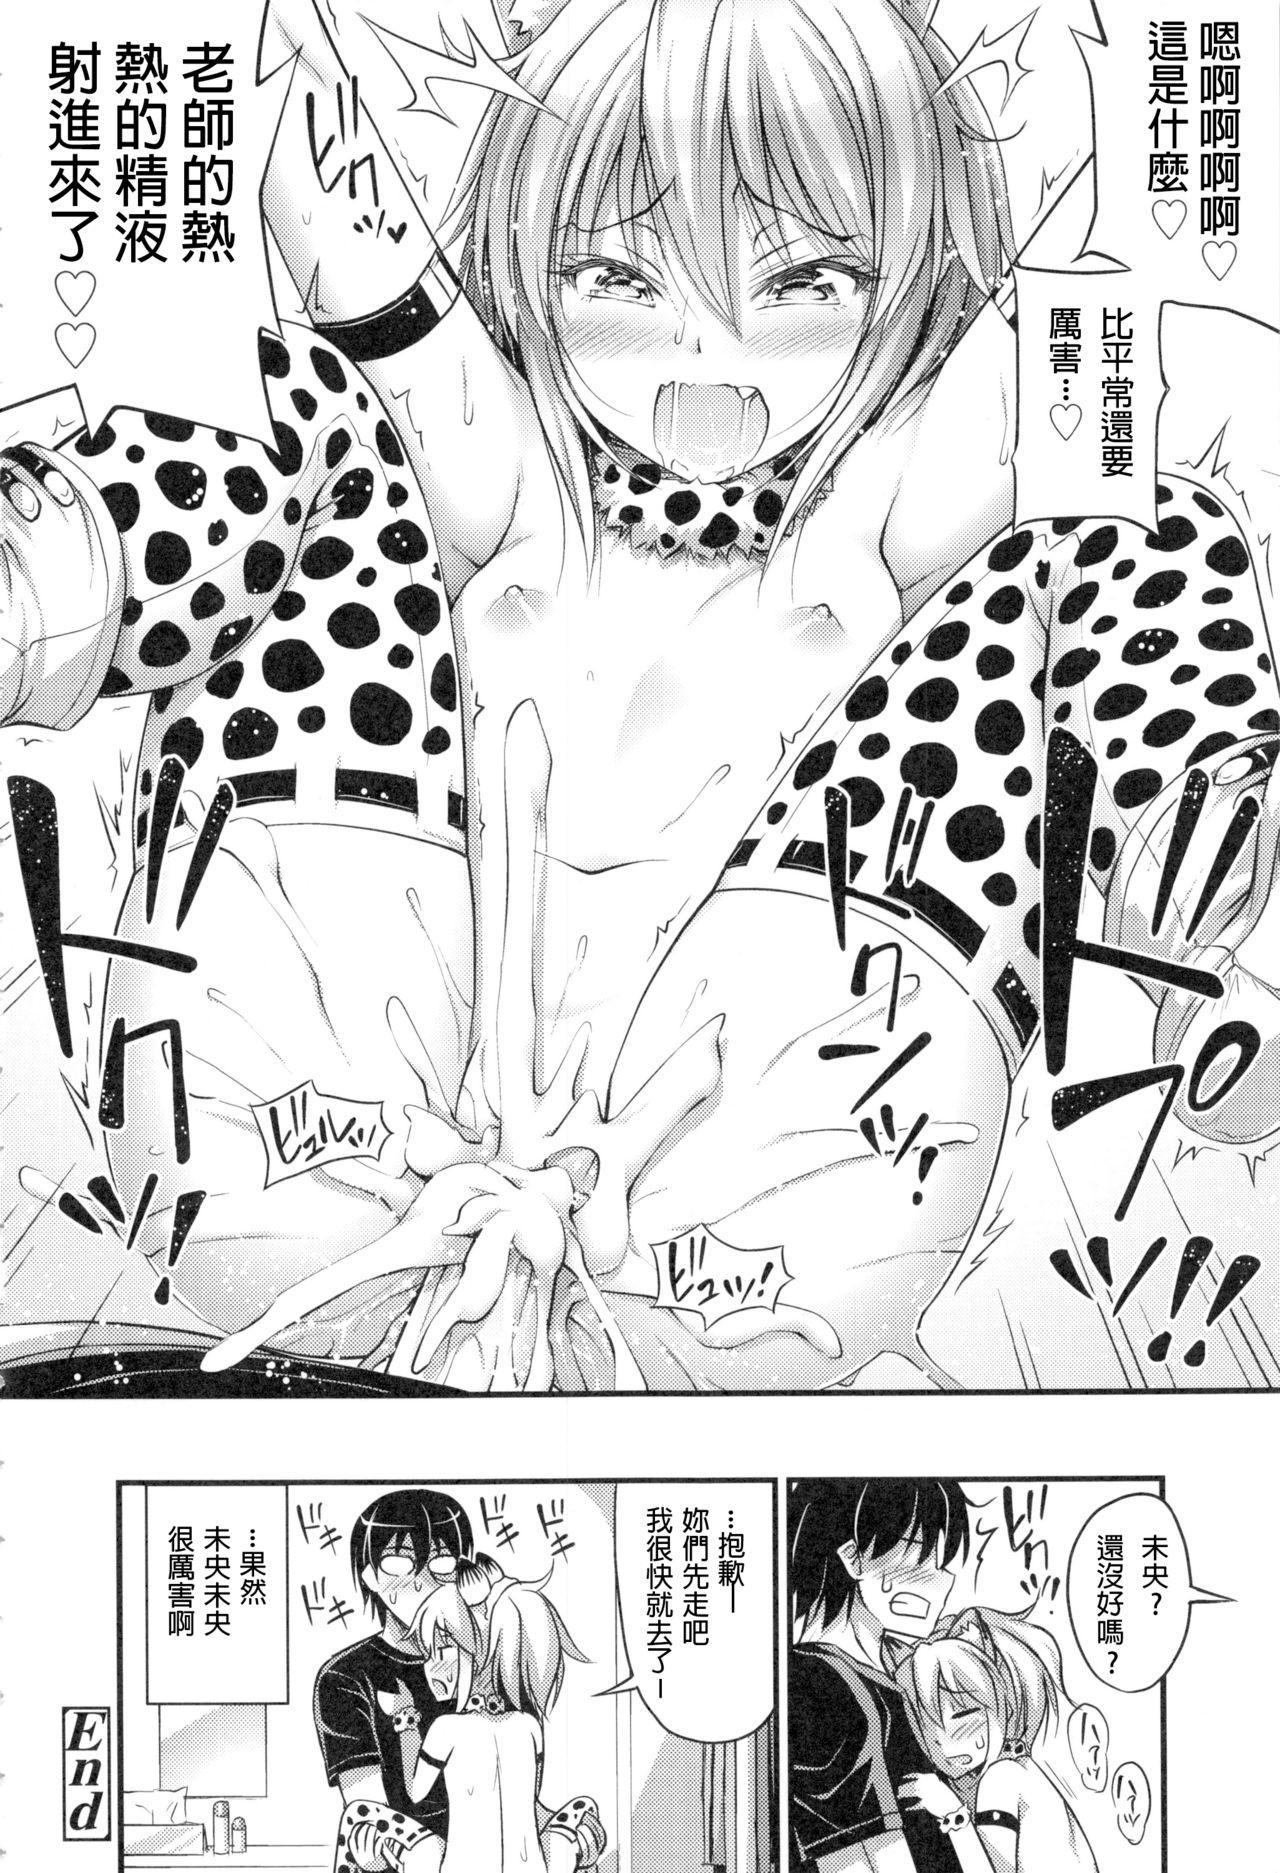 Onii-chan Sonna ni Short Pants Suki nano? 61